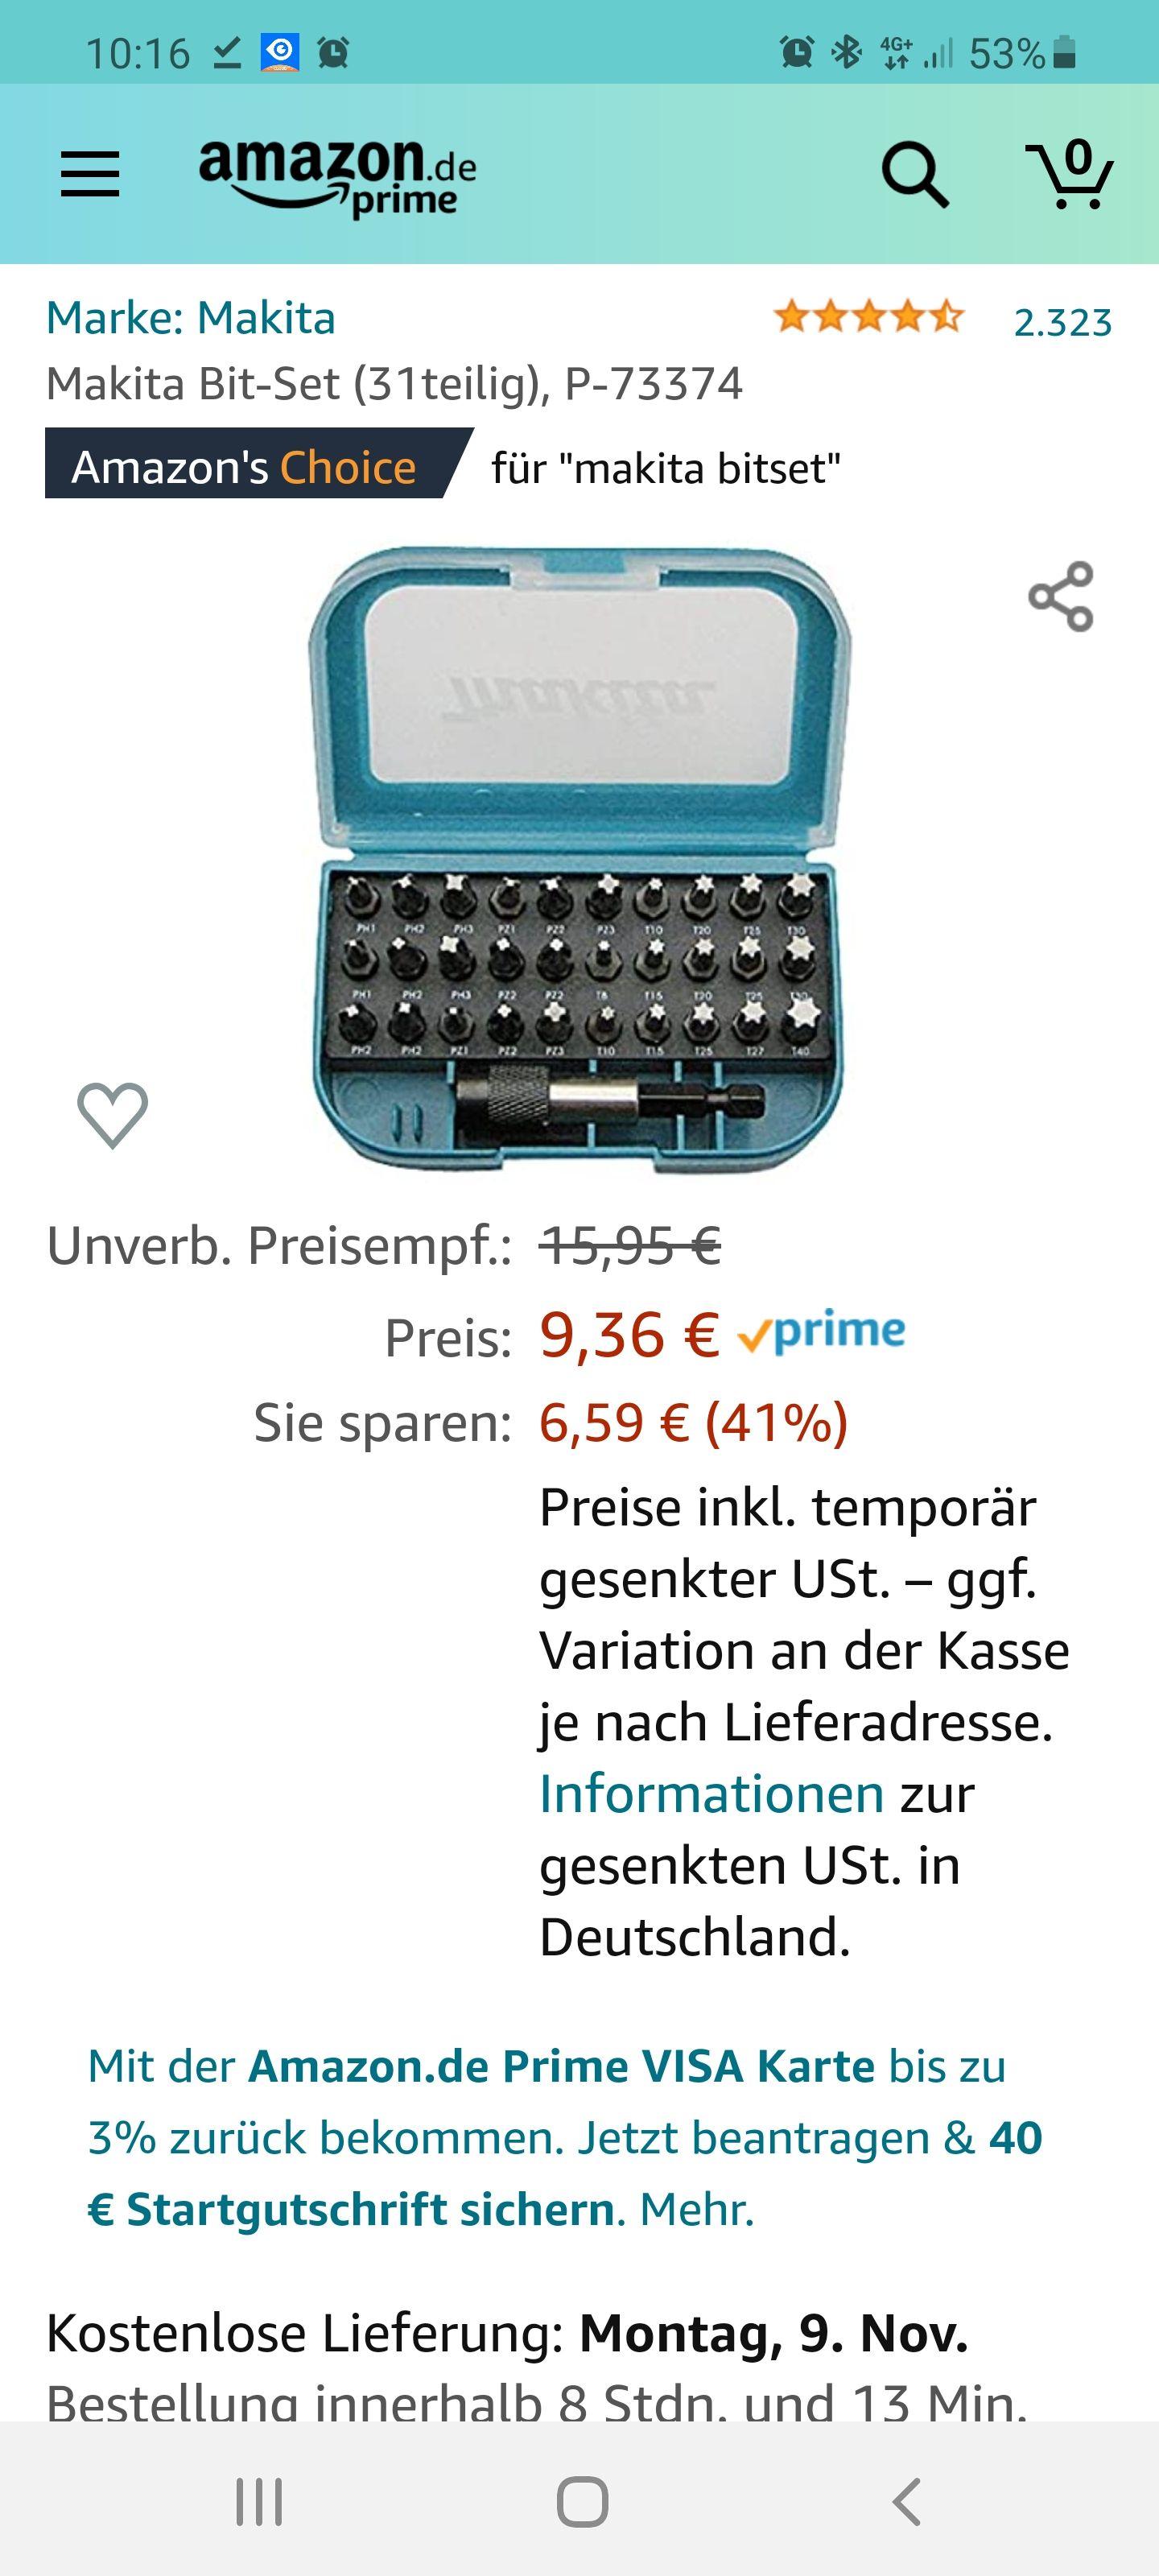 Makita Bitset 31-teilig P-73374 / Prime kostenloser Versand